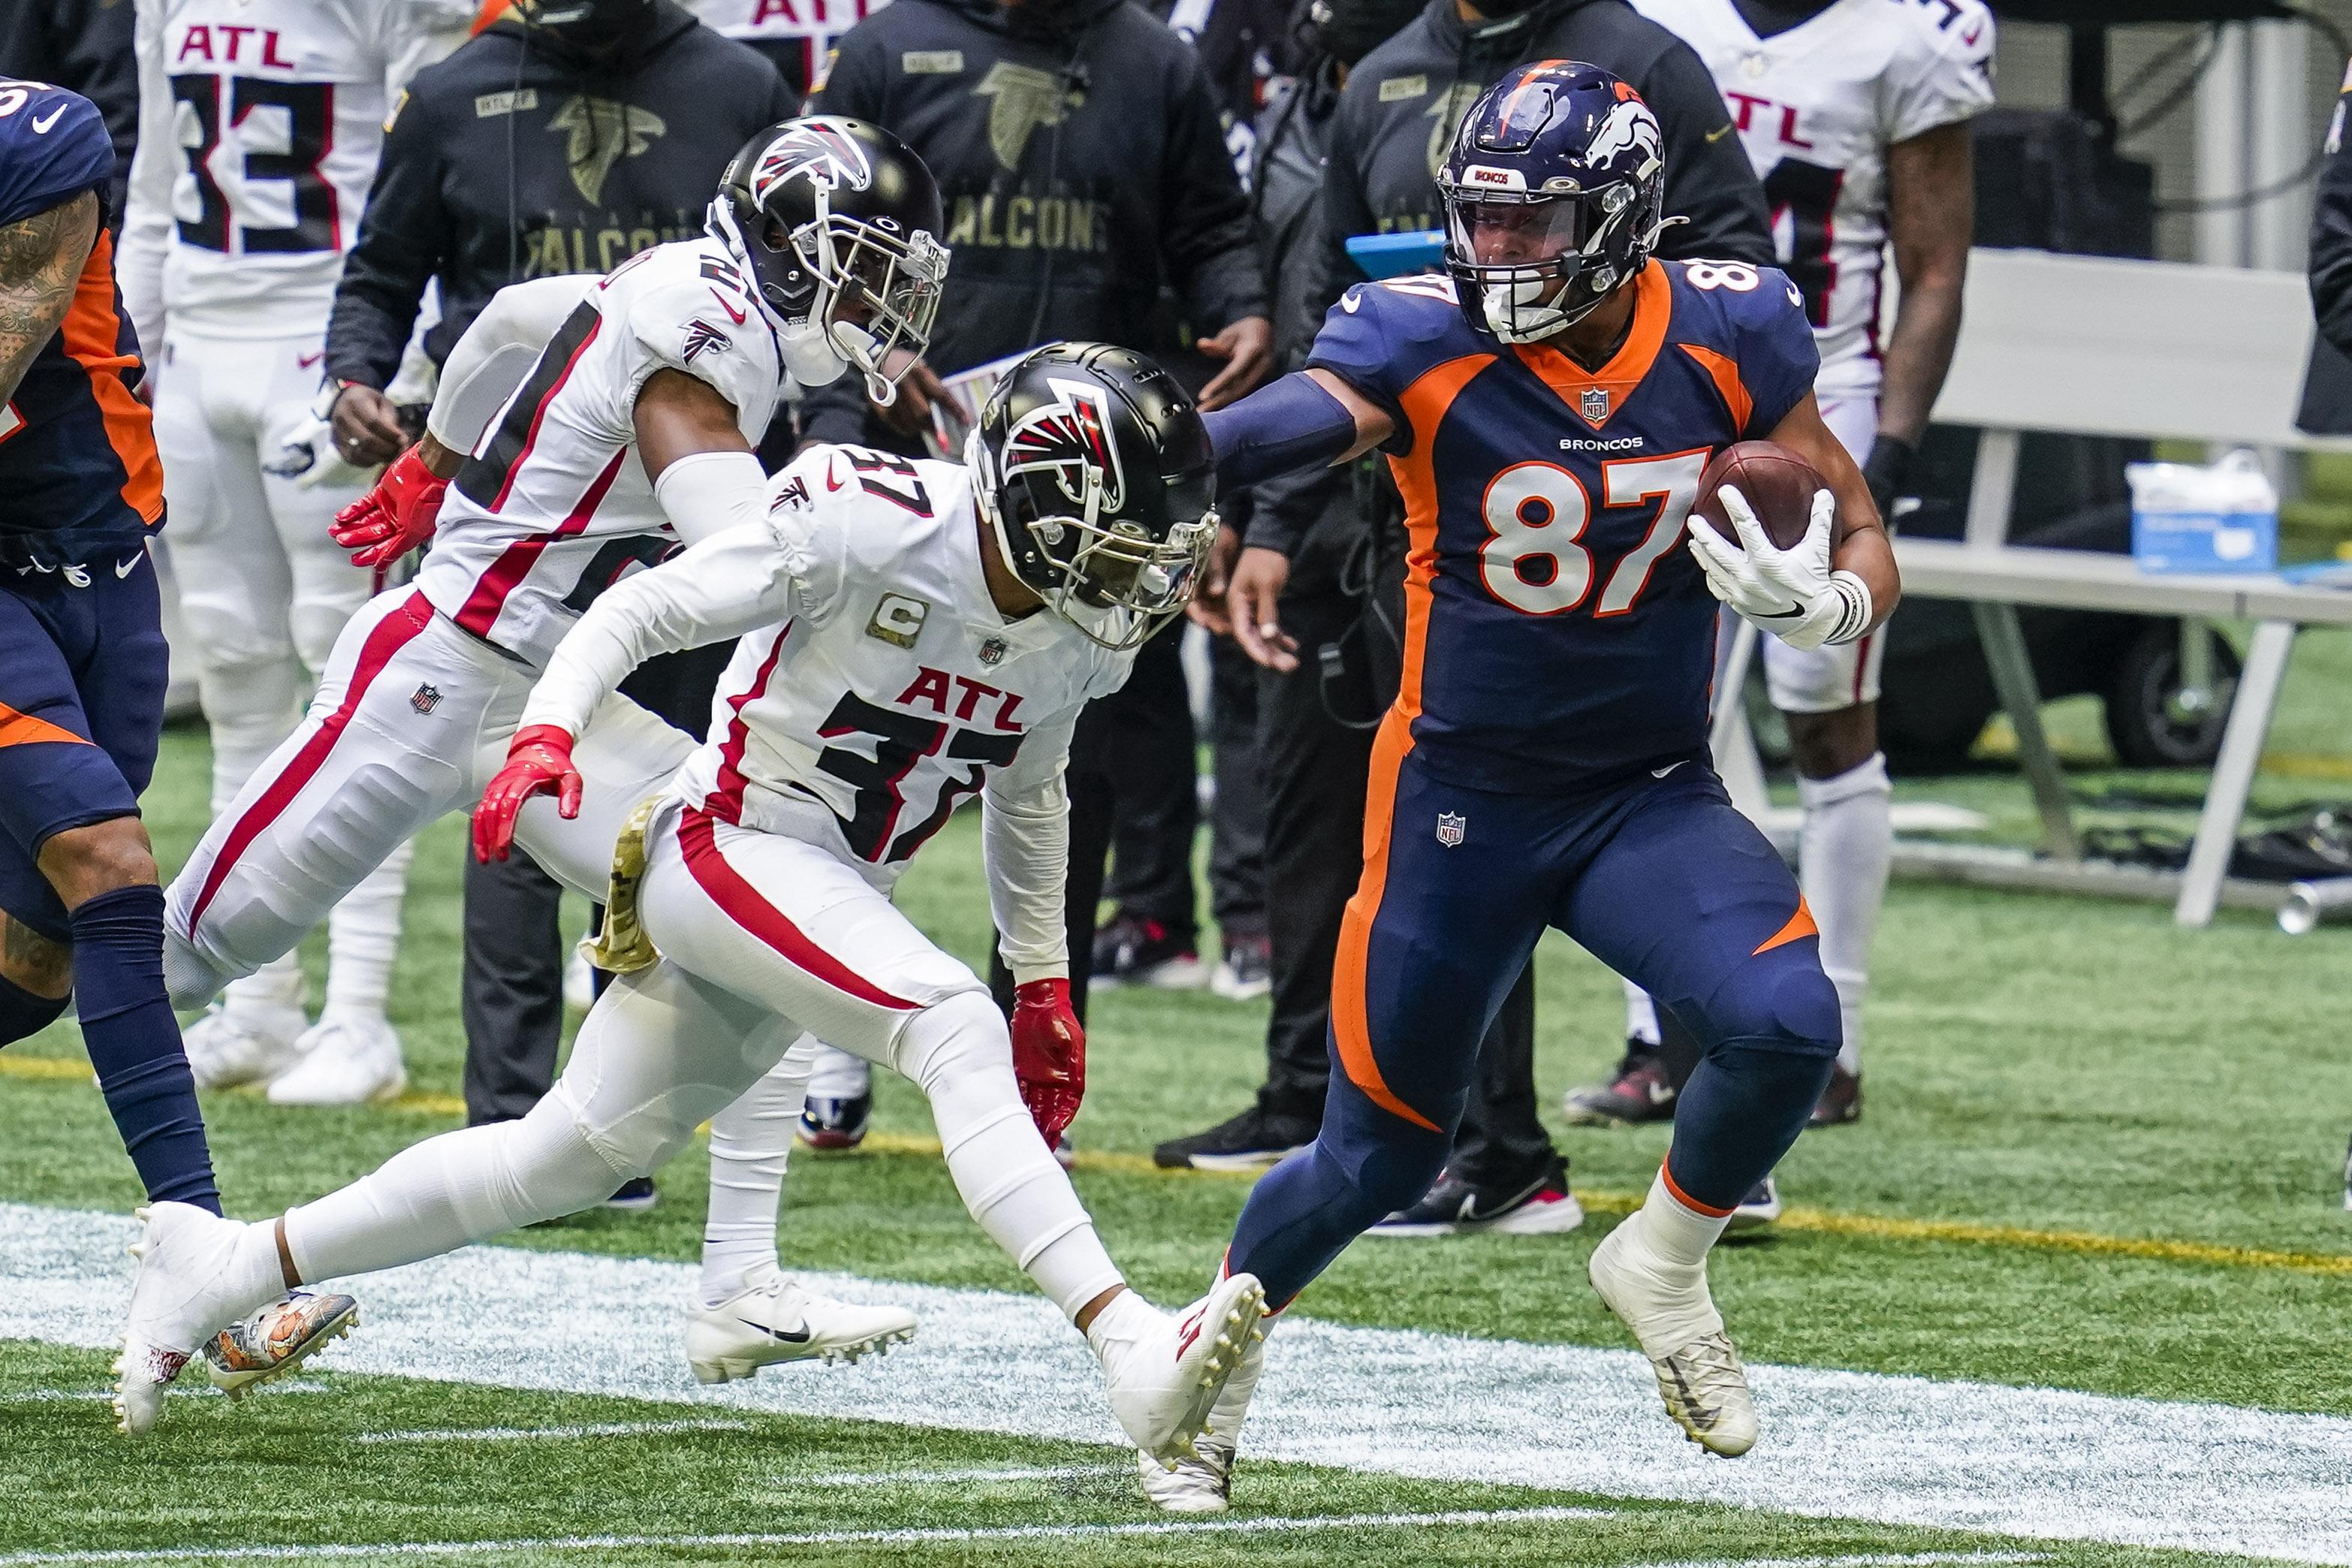 Denver Broncos tight end Noah Fant (87) runs against Atlanta Falcons safety Ricardo Allen (37) during the first quarter at Mercedes-Benz Stadium.